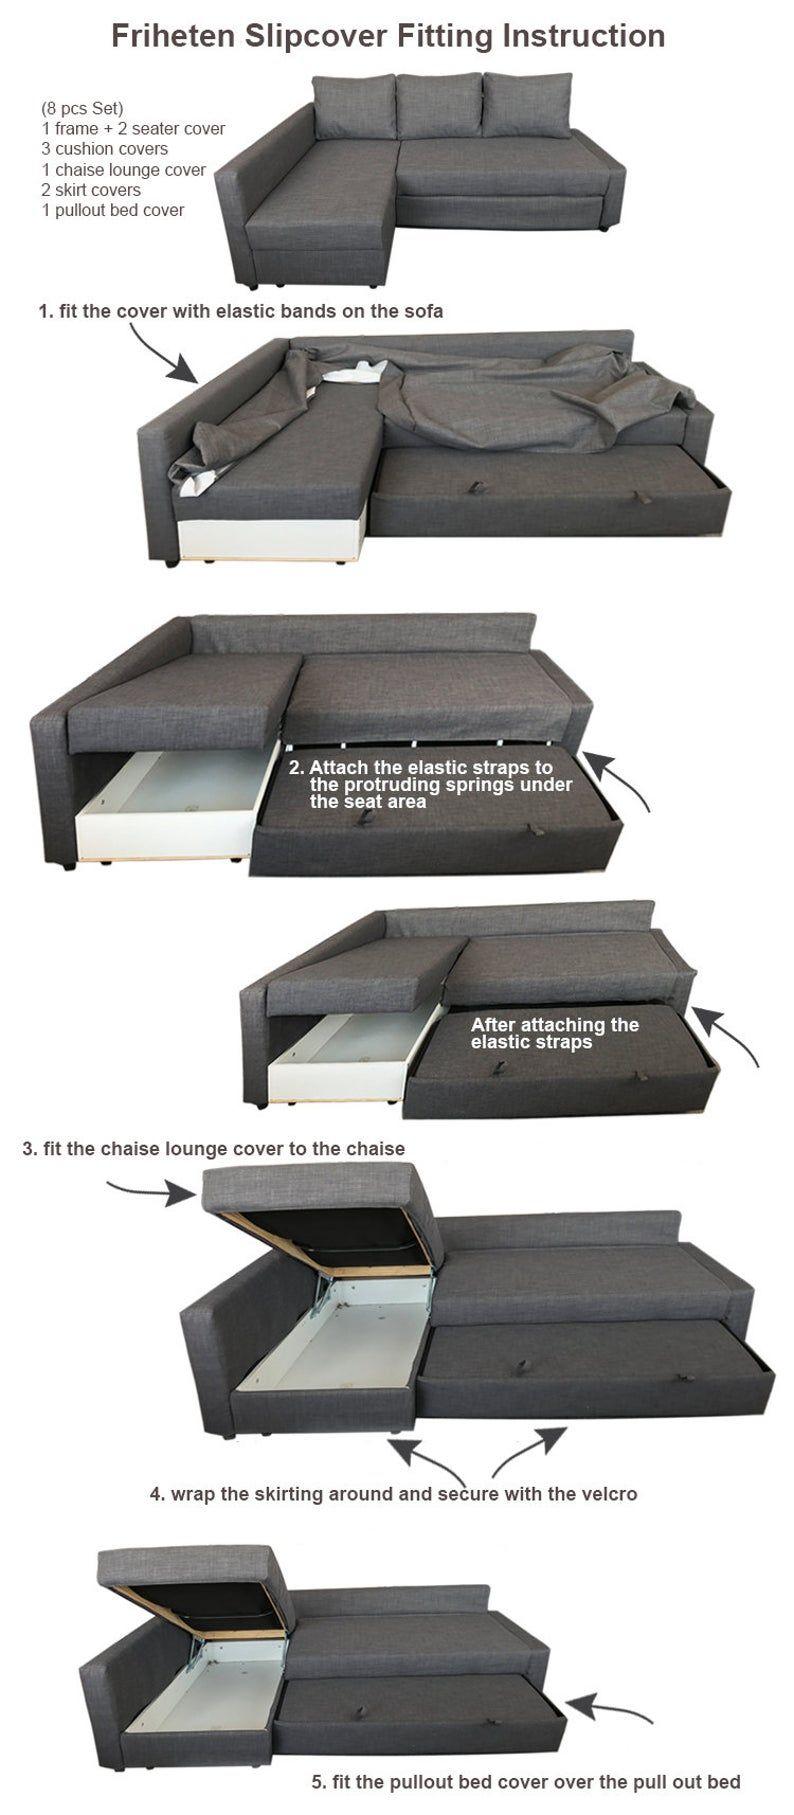 Ikea Ektorp Cover 2 2 Sofa Corner Slipcover Blekinge White Sectional 500 475 90 White Corner Sofas White Sectional Sofa Corner Sofa Covers